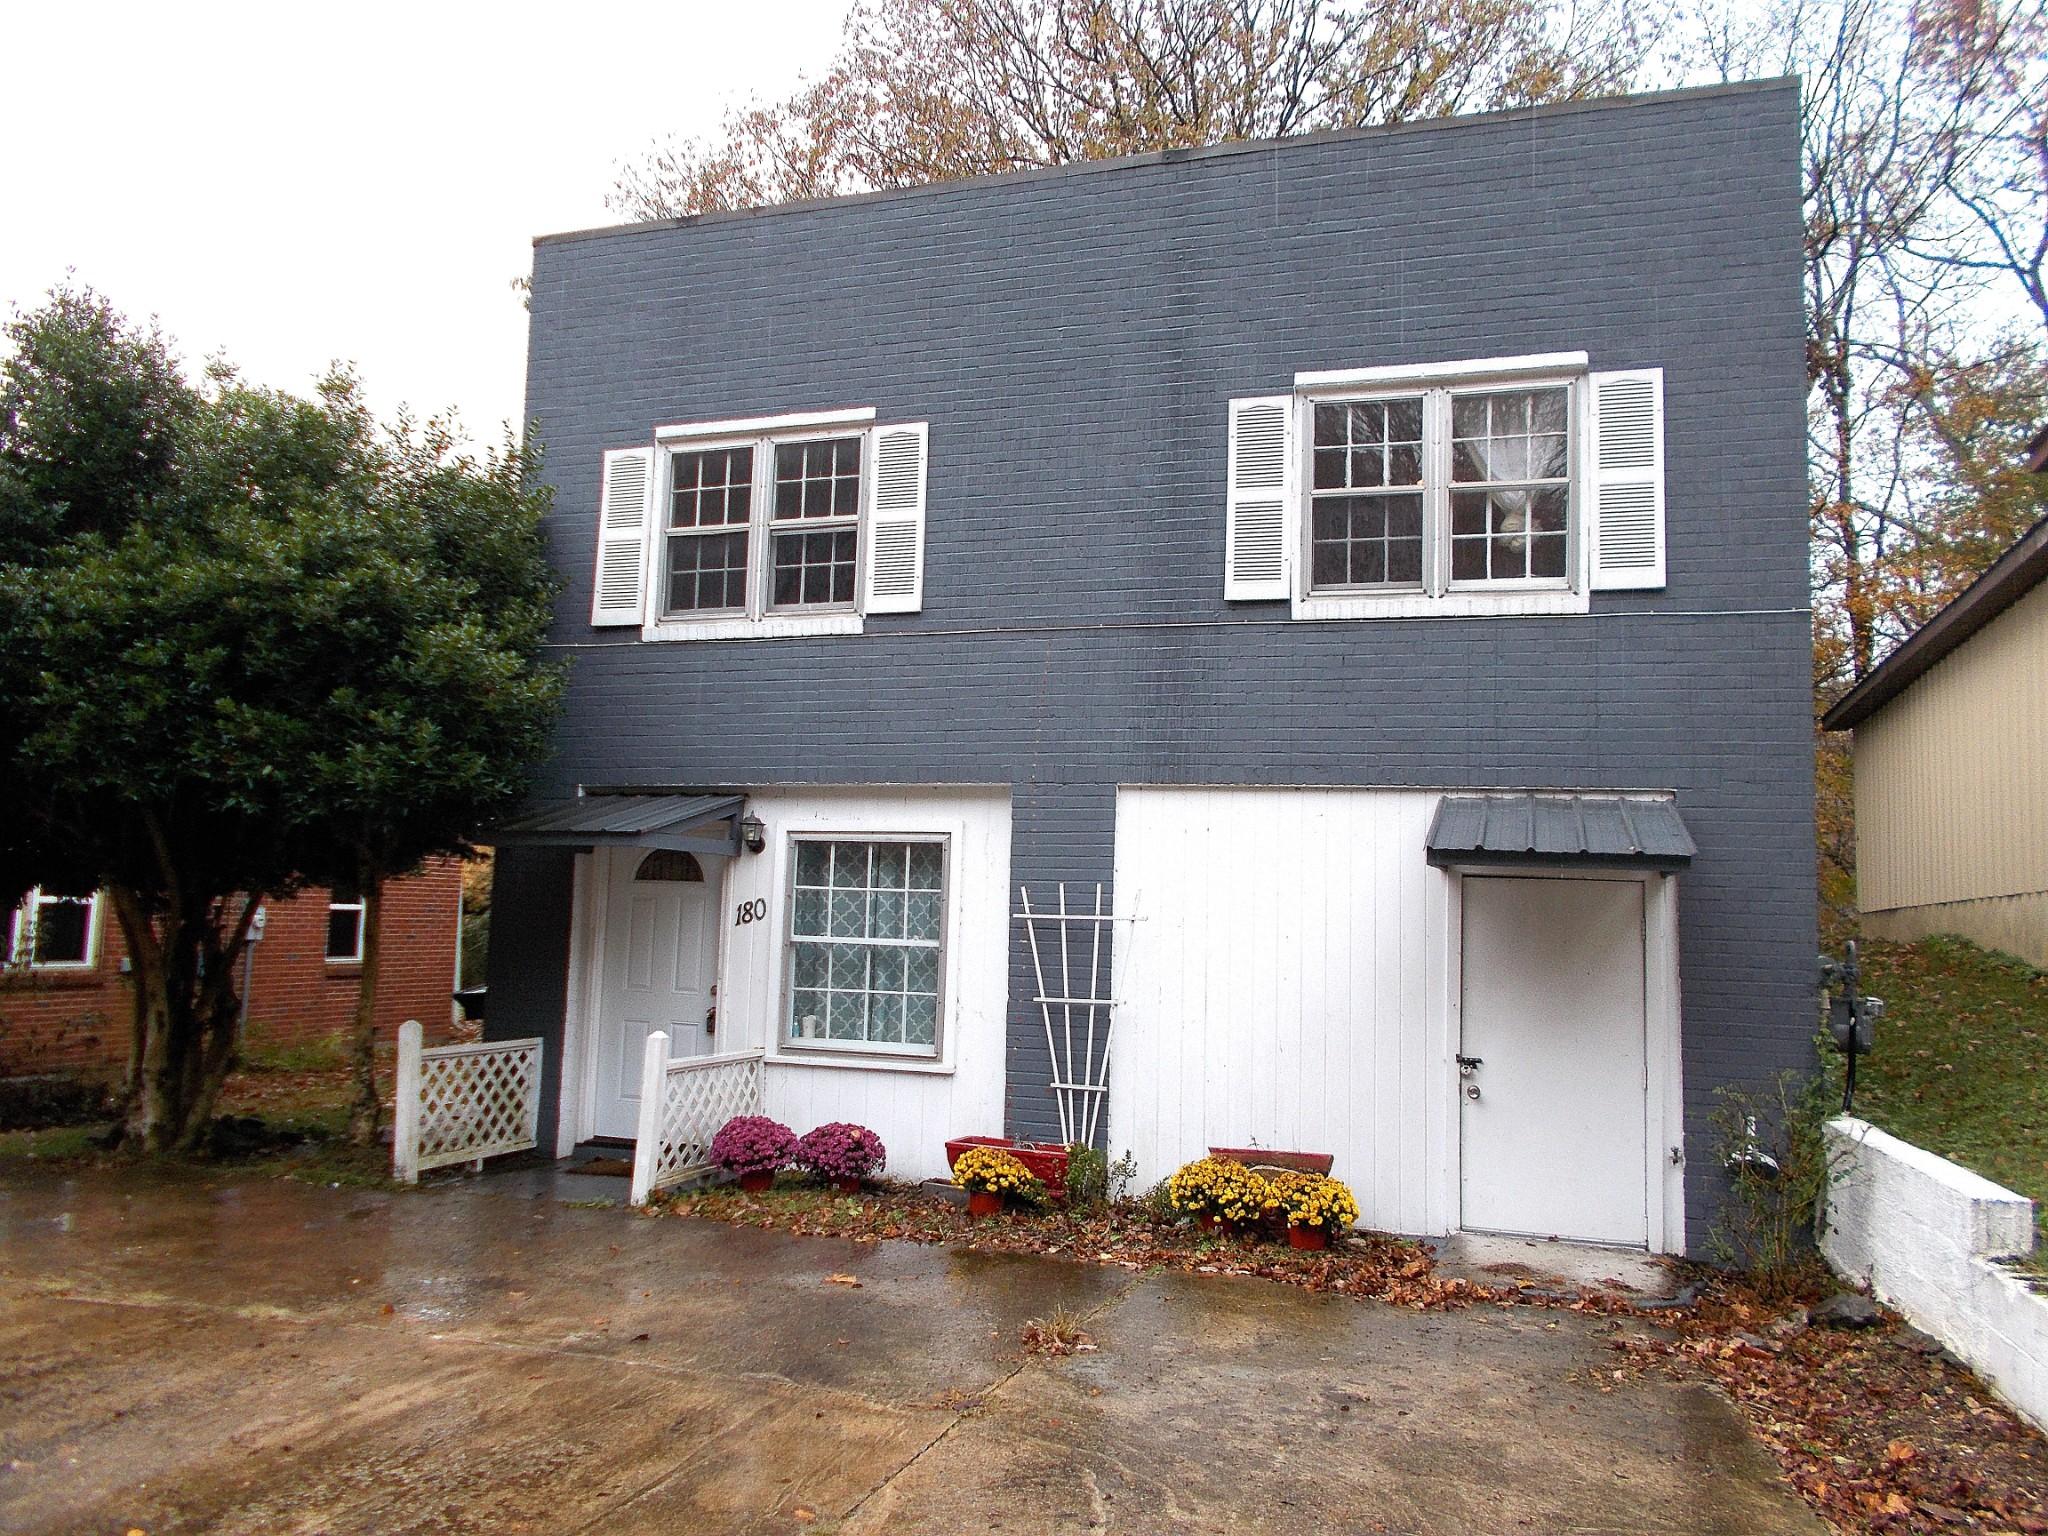 180 Linden Rd, Centerville, TN 37033 - Centerville, TN real estate listing